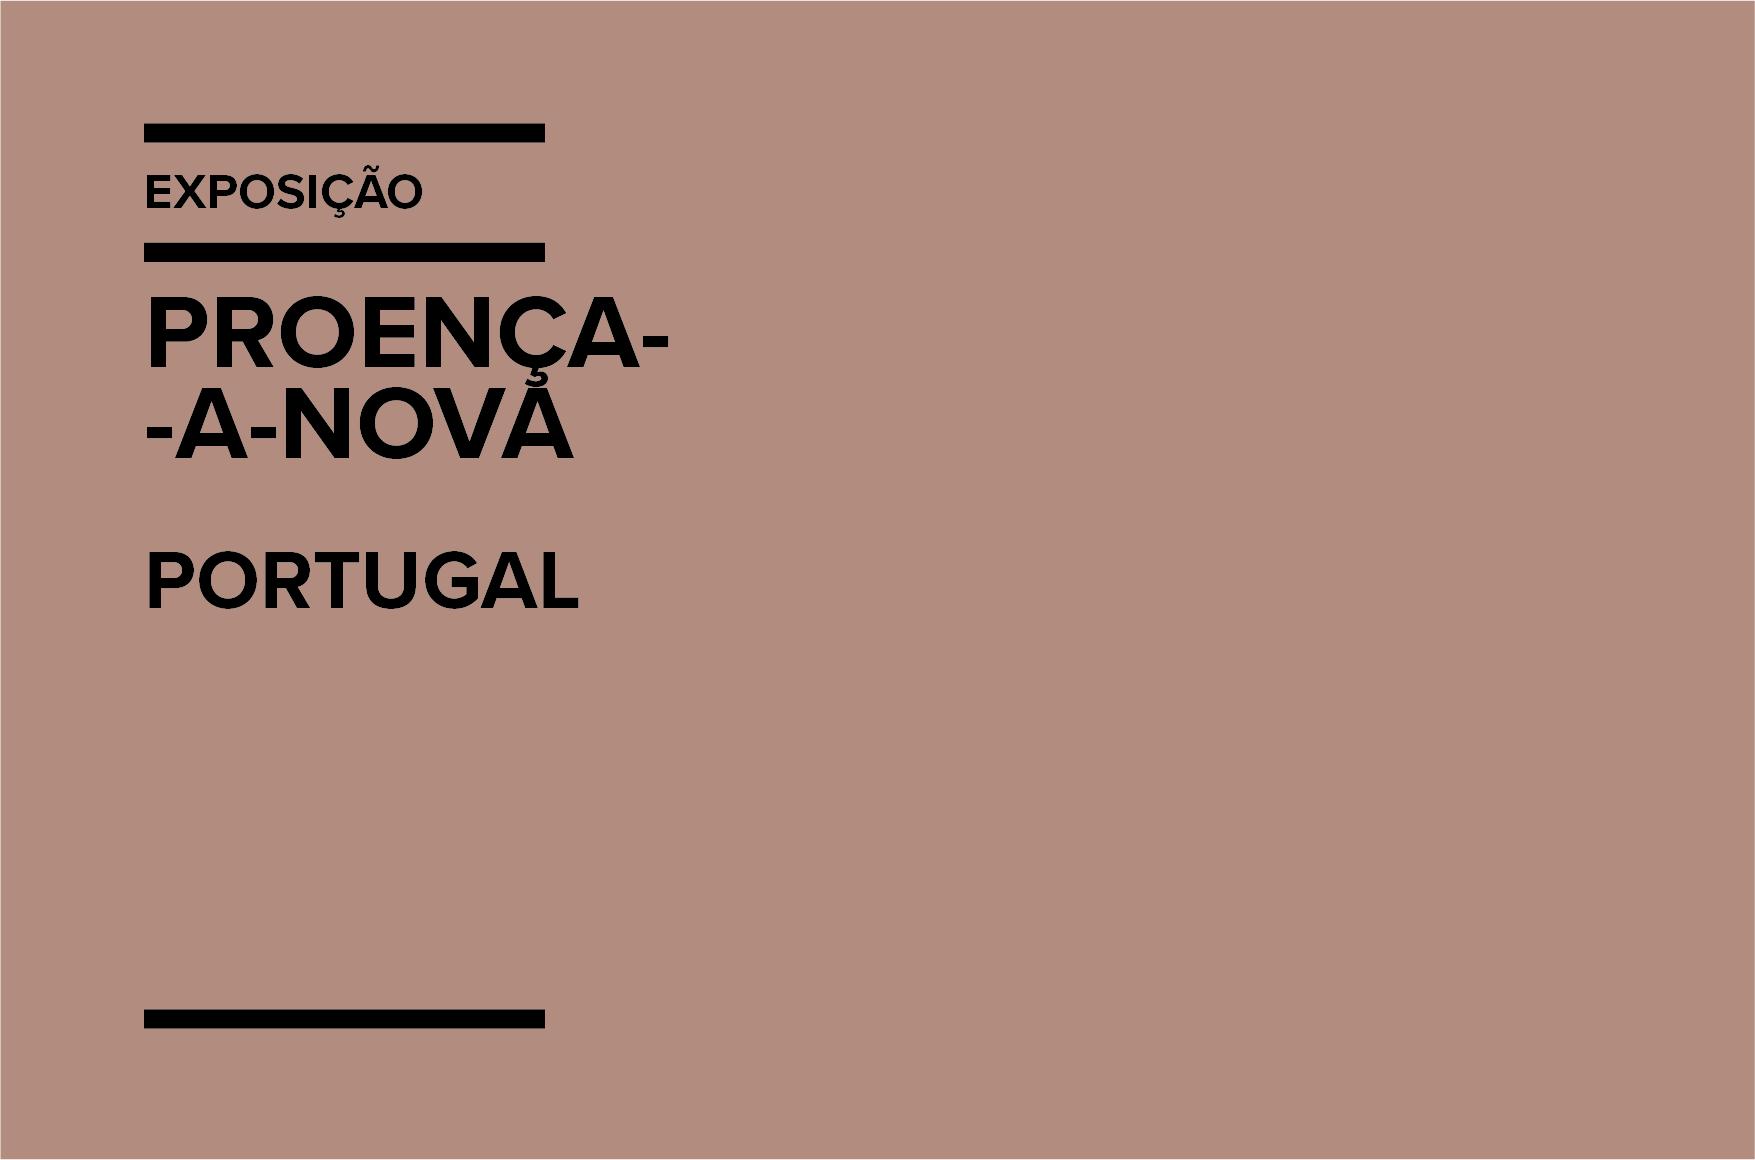 PROENÇA-A-NOVA